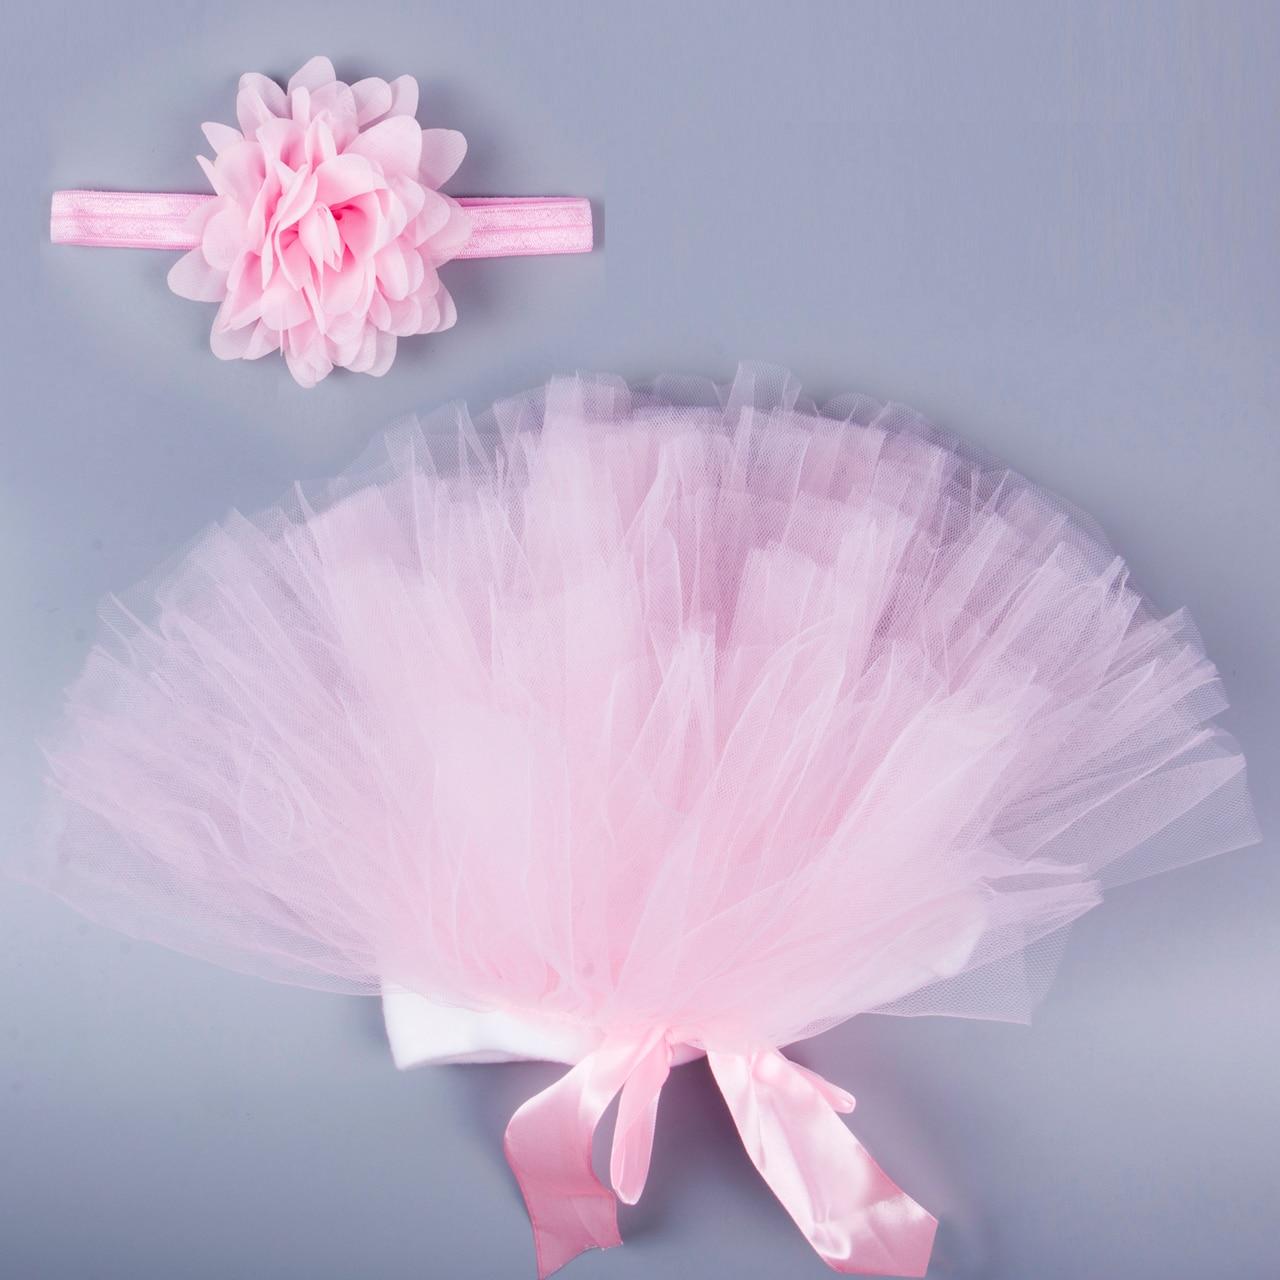 0-24M-Newborn-Toddler-Infant-Baby-Tutu-Clothes-Skirt-Headdress-Flower-Photography-Prop-2PCS-Outfit-0-24M-3